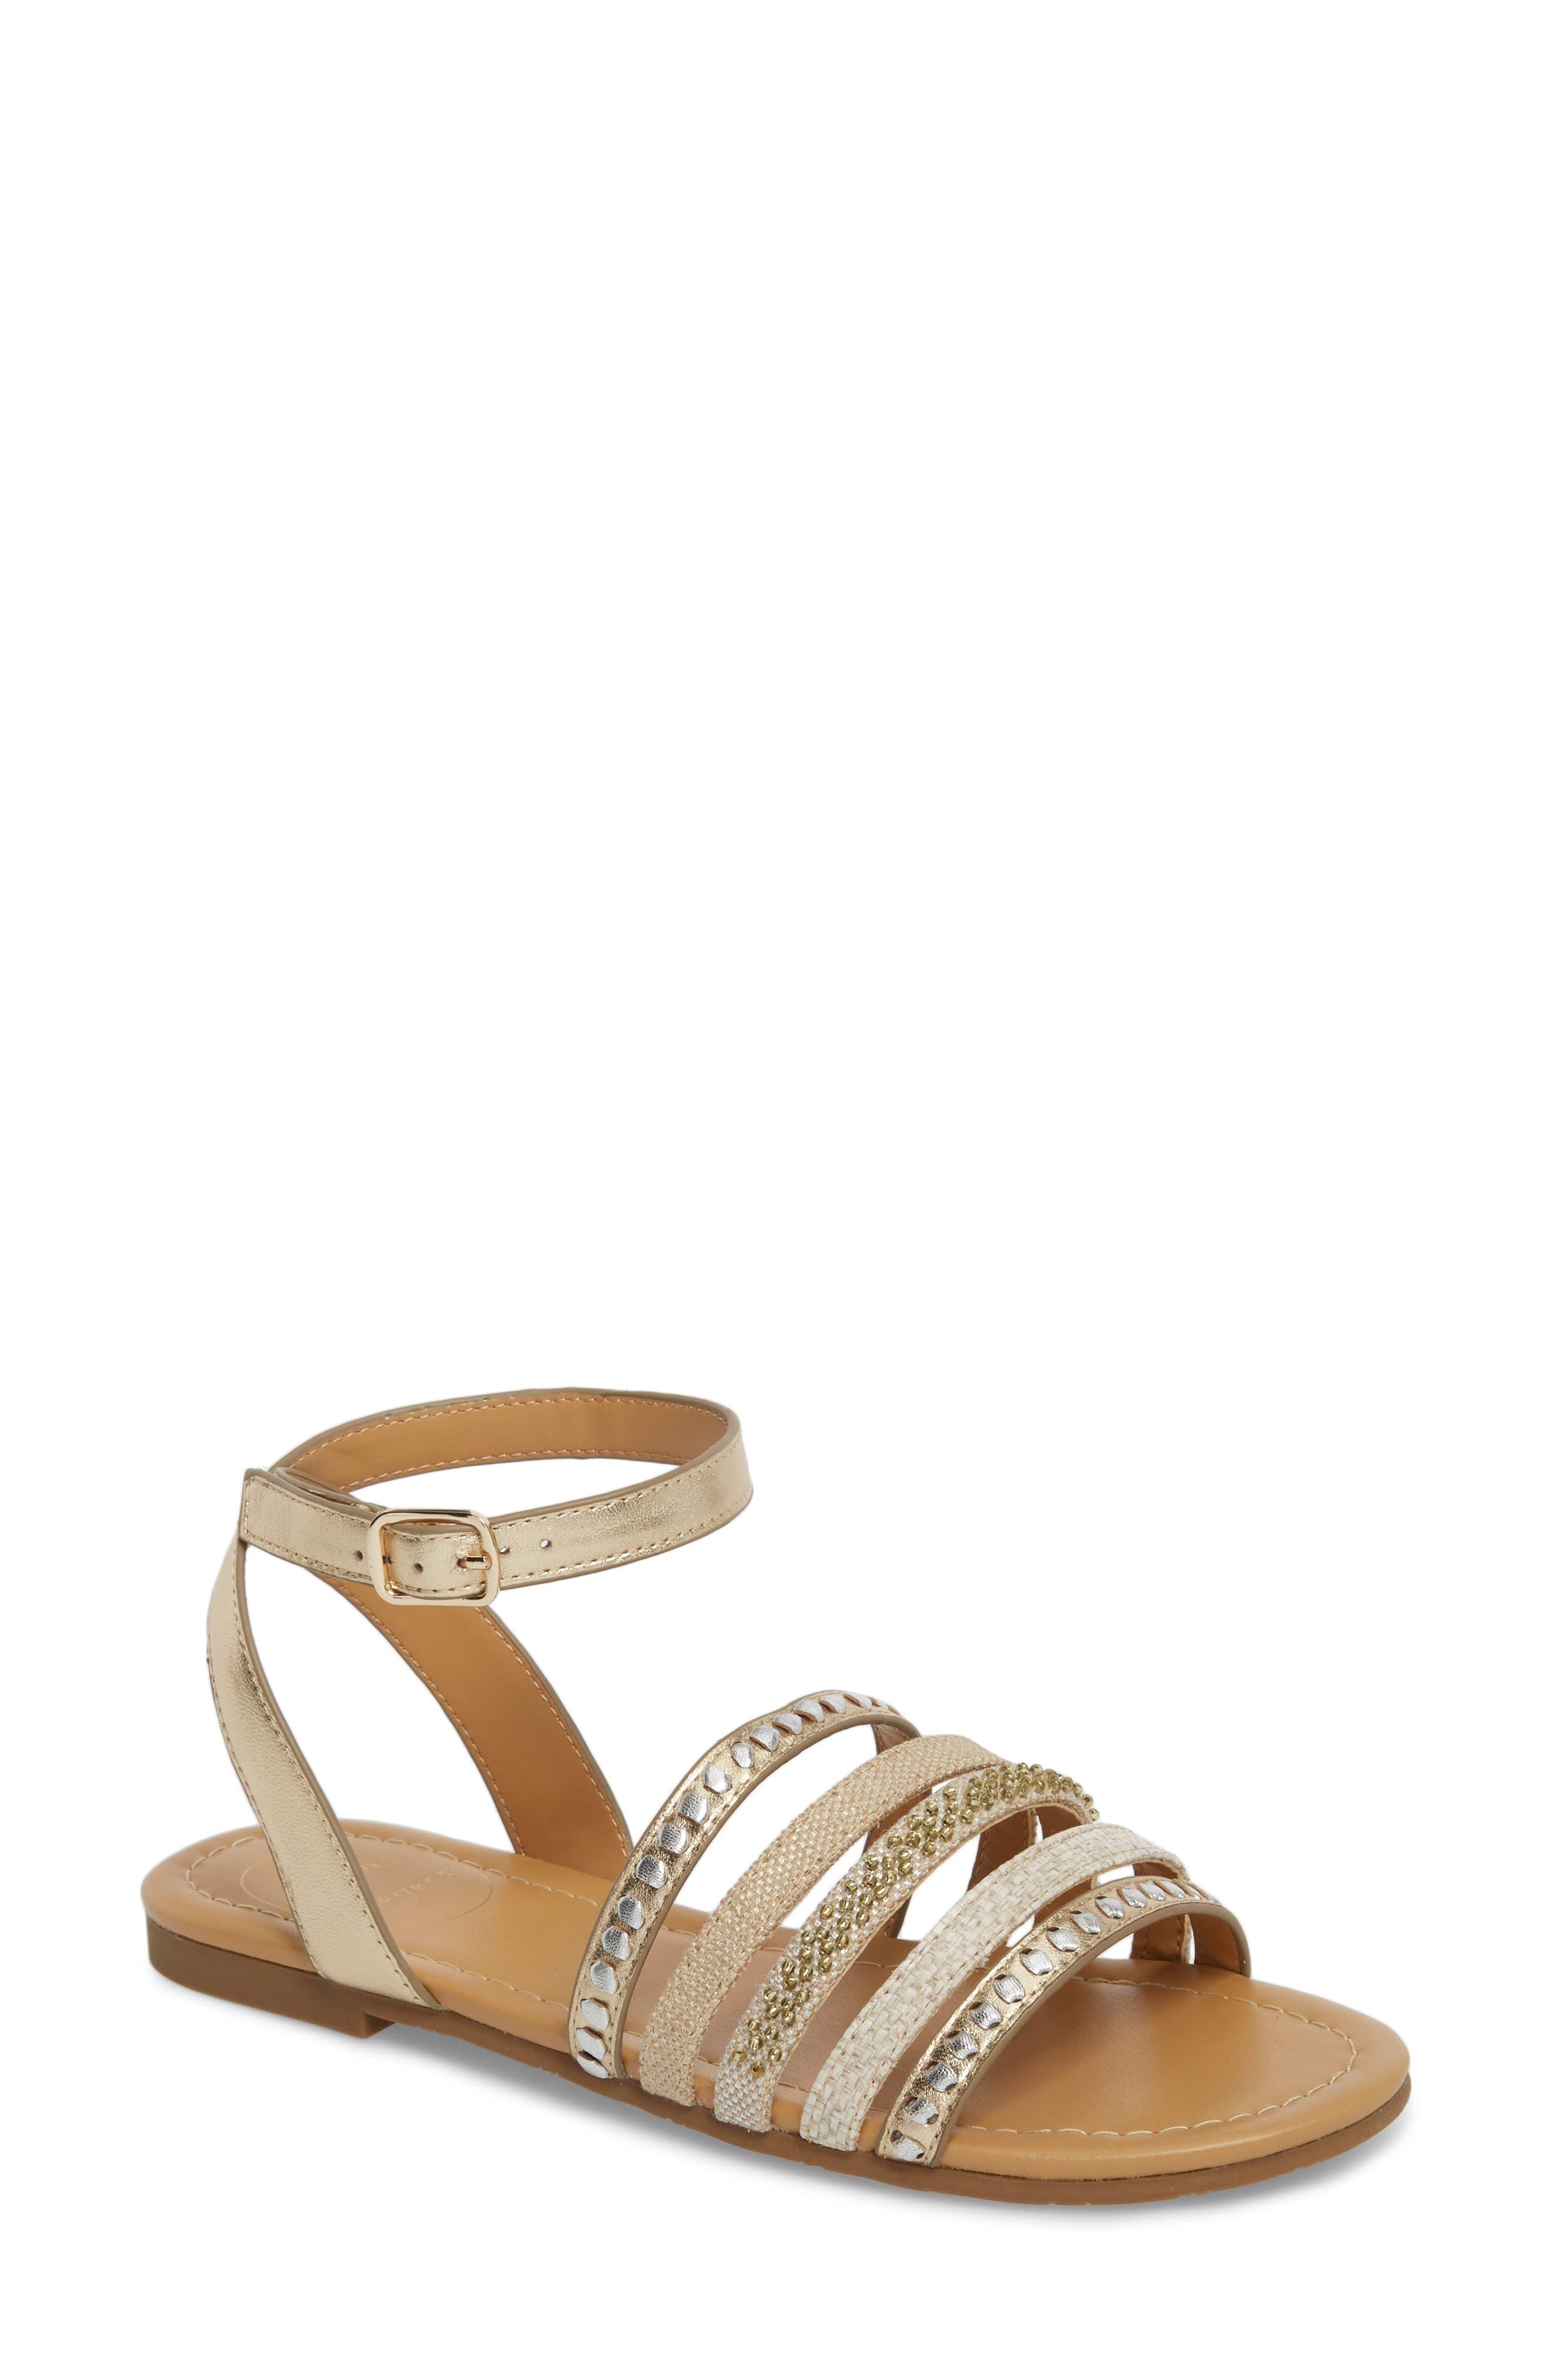 Hannah Braided Embellished Sandal,                         Main,                         color, Platinum/ Silver Leather